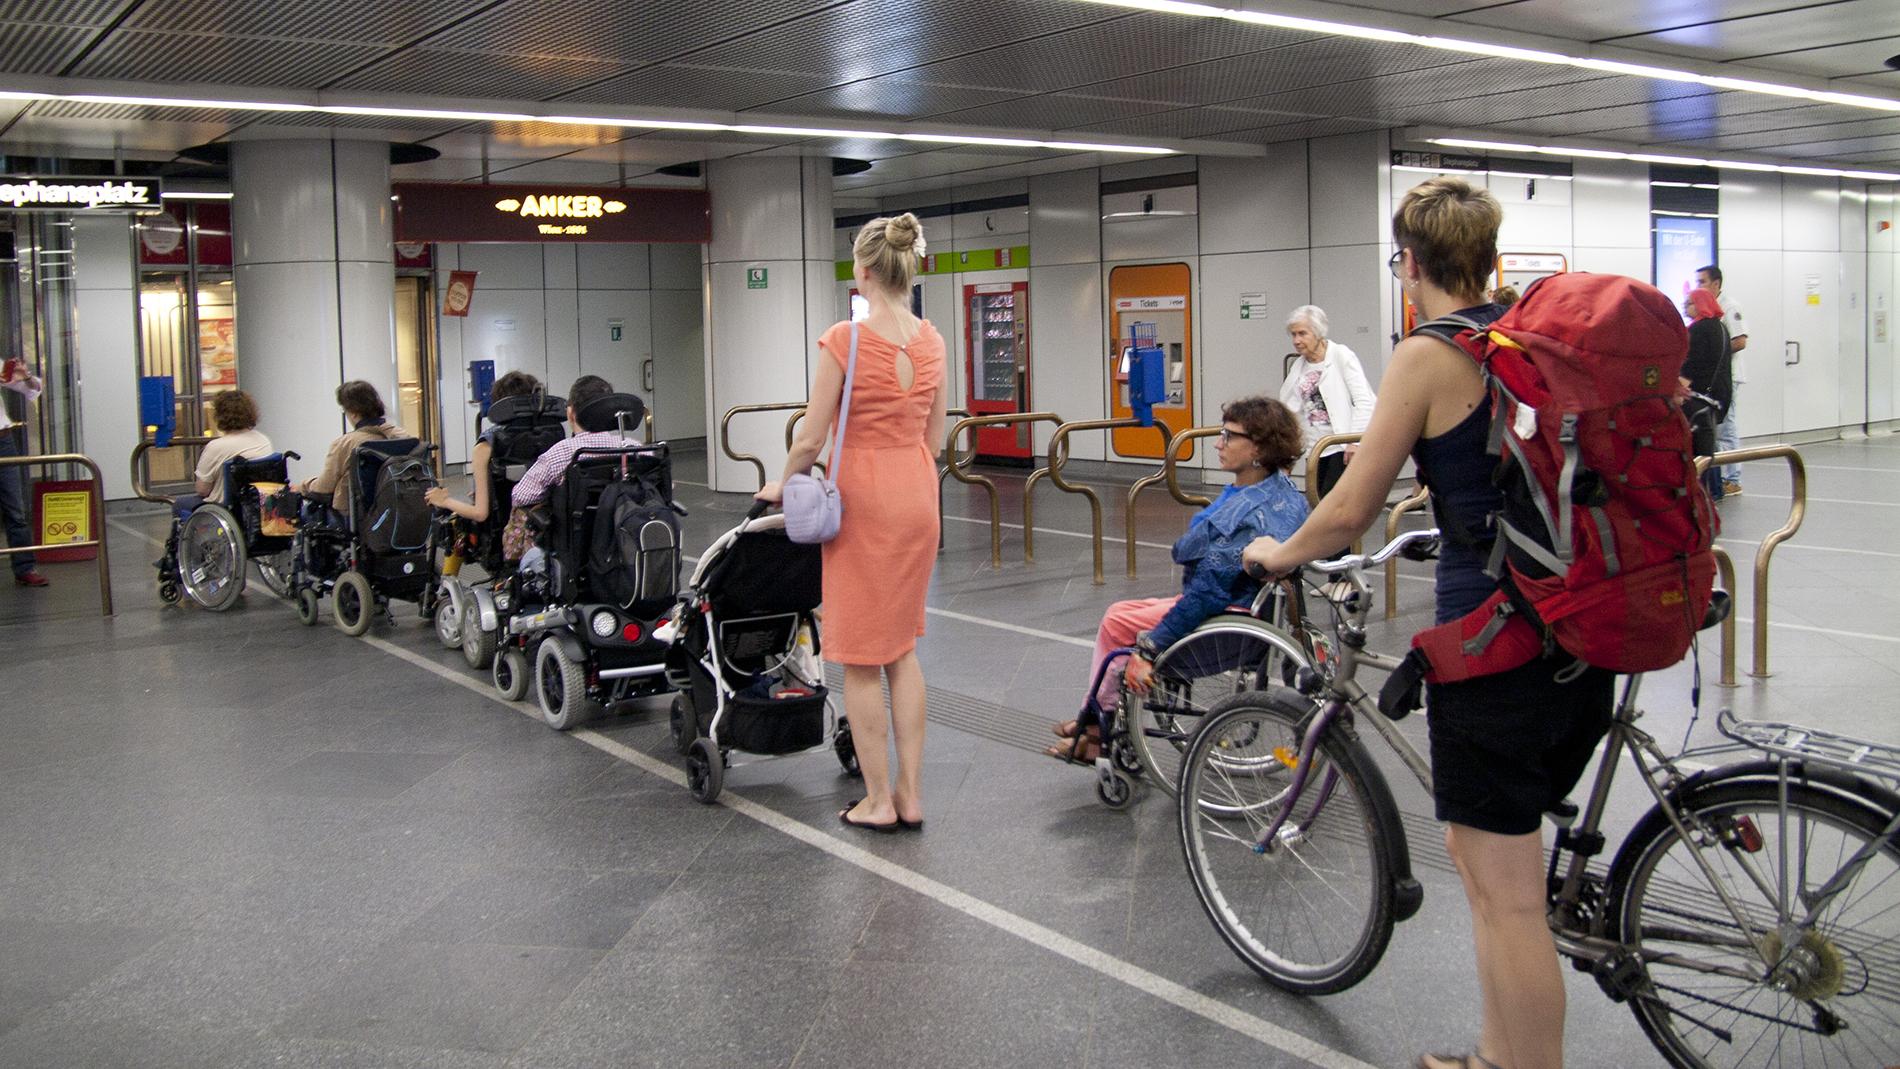 Aufzugdefekt am 13. Juli 2016 bei U-Bahn Station Stephansplatz